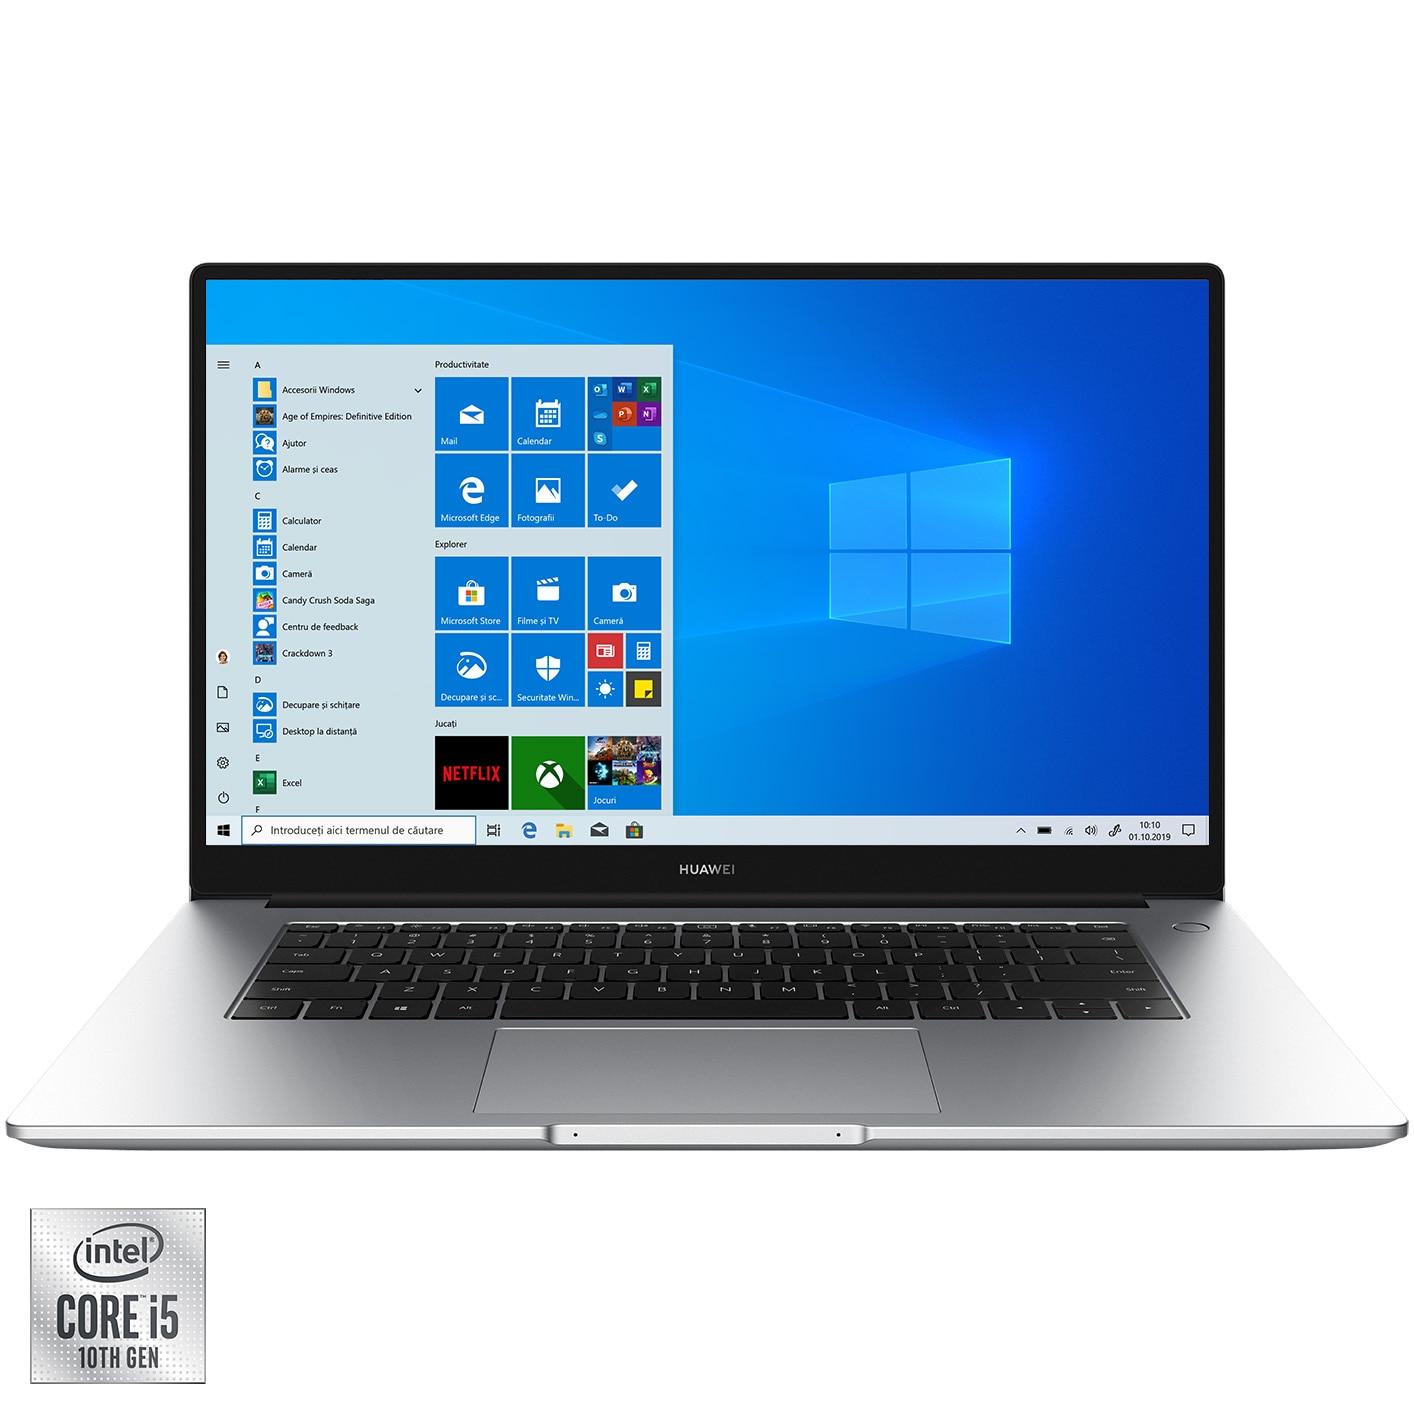 "Fotografie Laptop Huawei MateBook D15 2021 cu procesor Intel® Core™ i5-10210U pana la 4.20 GHz pana la 4.20 GHz, 15.6"", Full HD, IPS, 16GB, 512GB SSD, Intel® UHD Graphics, Windows 10 Home, Silver"